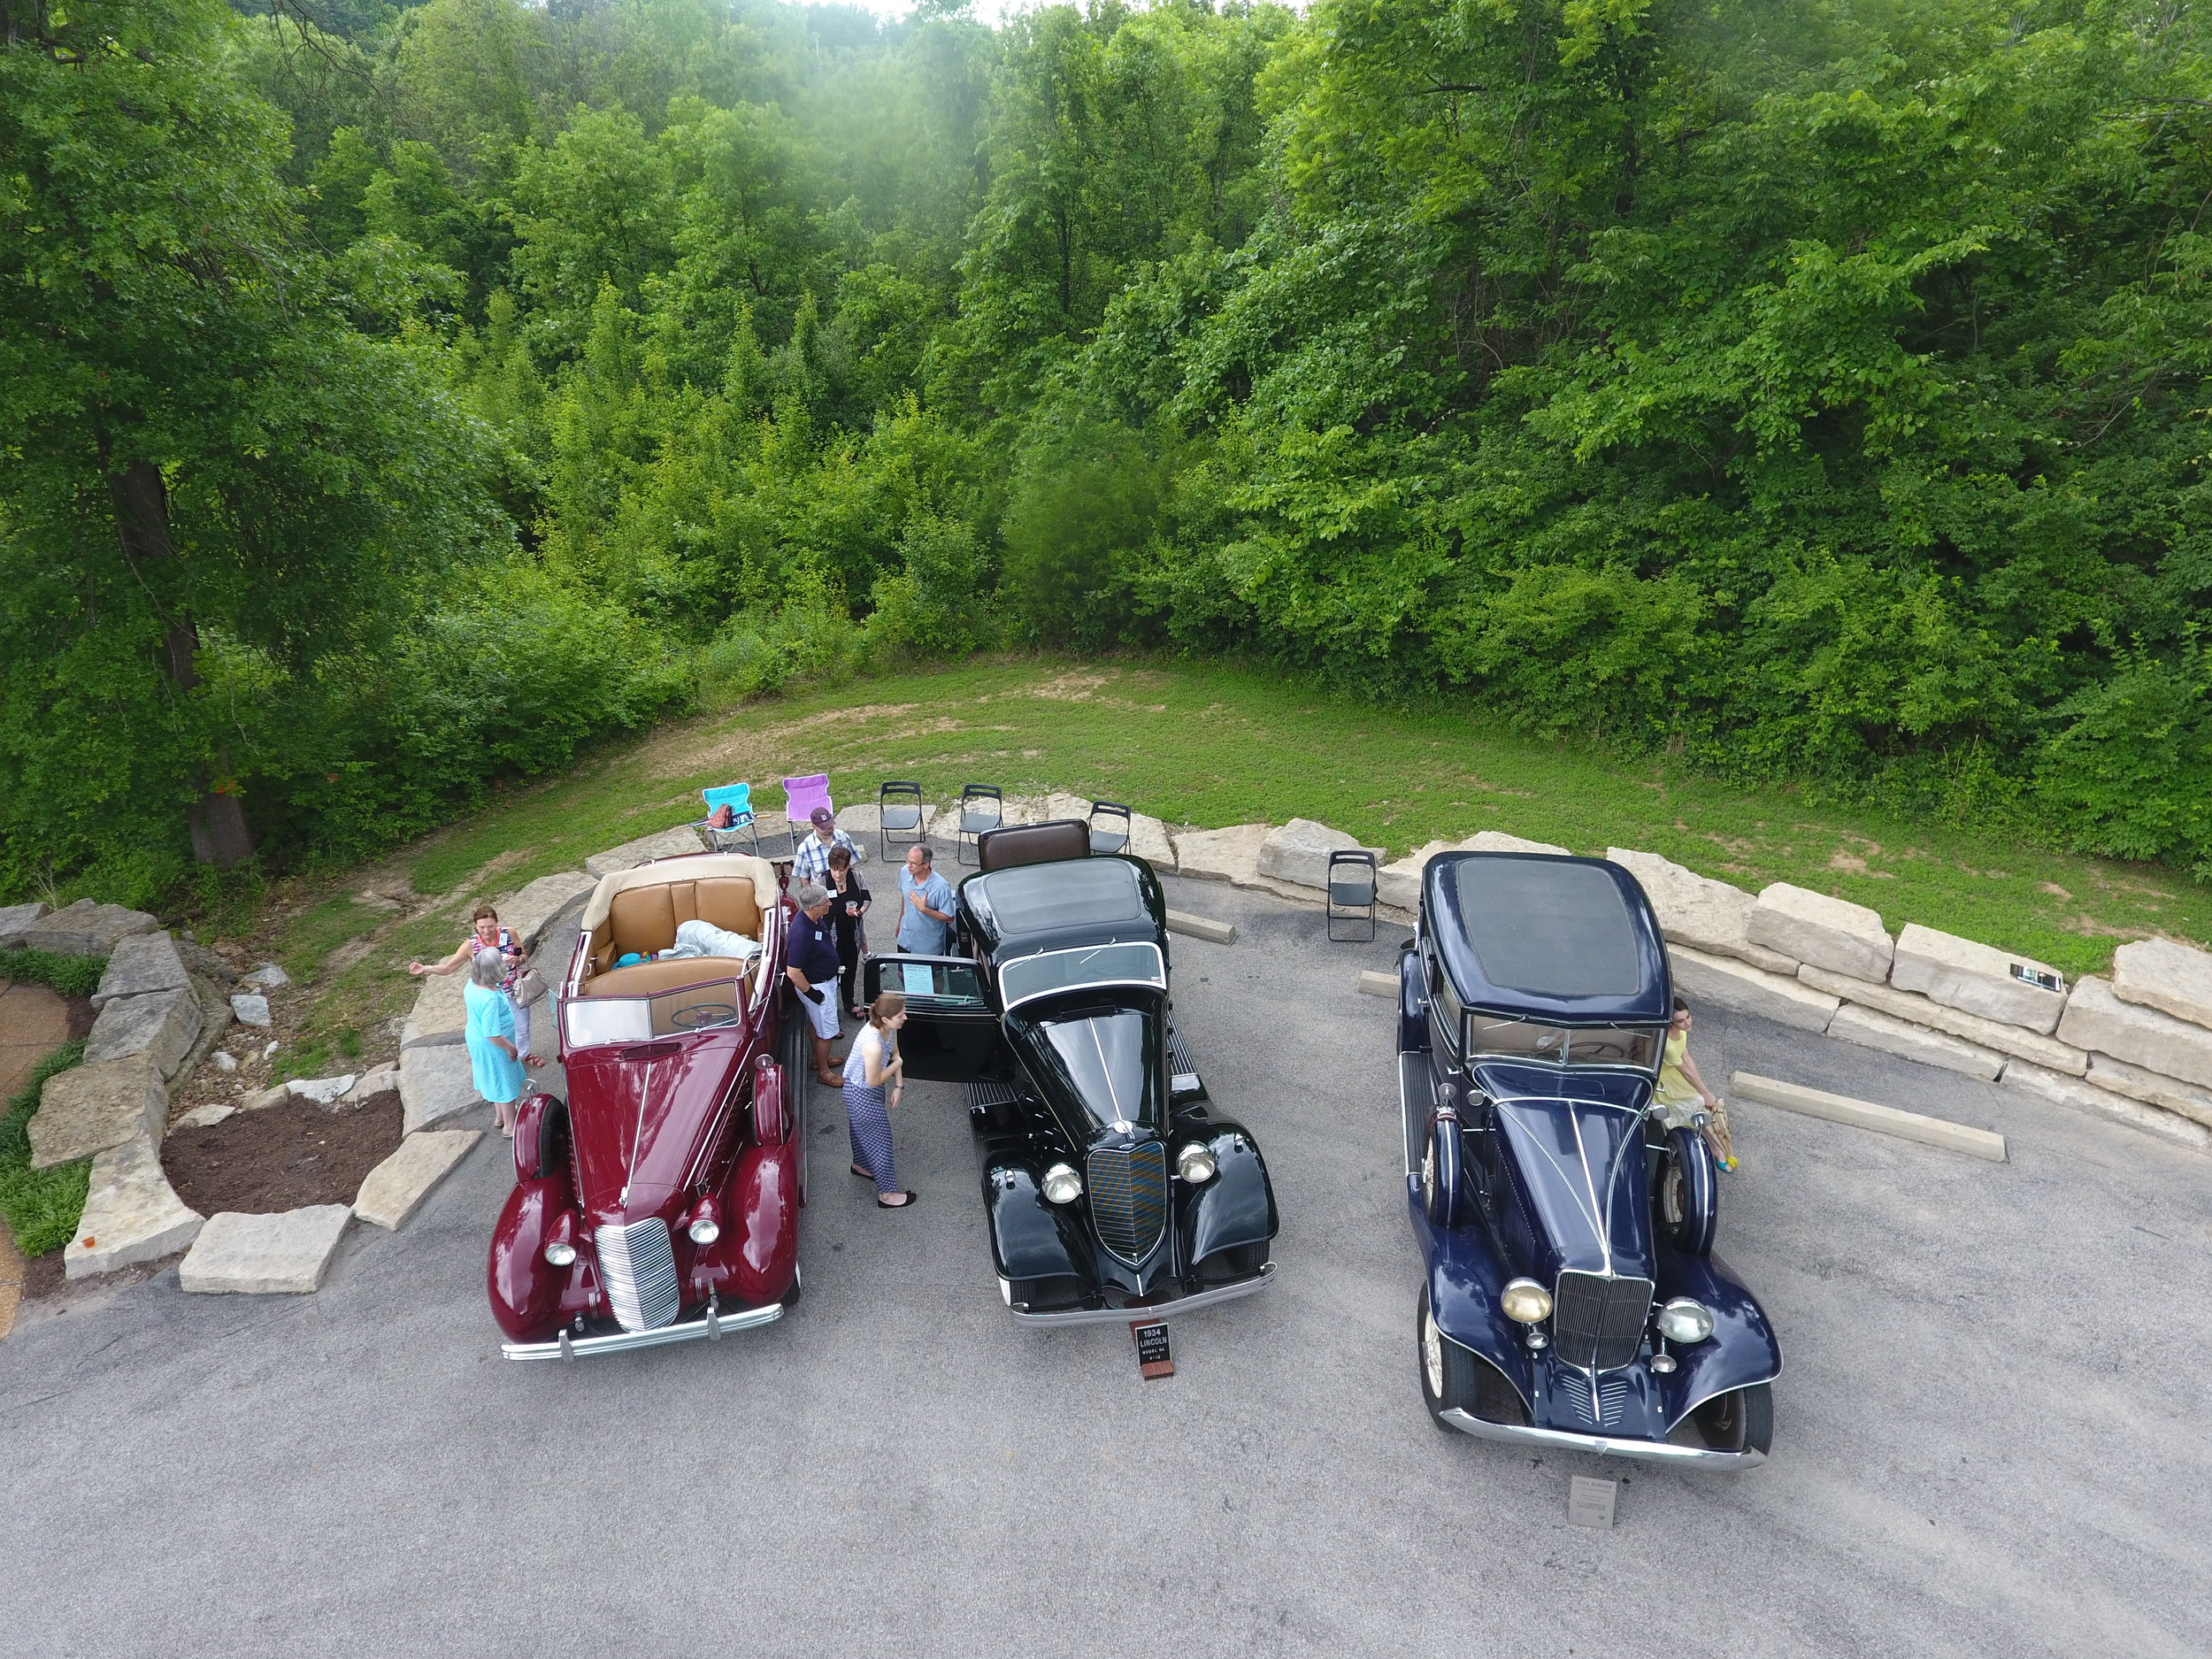 A birds eye view of three Classic marques, l-r 1936 Cadillac, 1934 Lincoln, 1934 Auburn